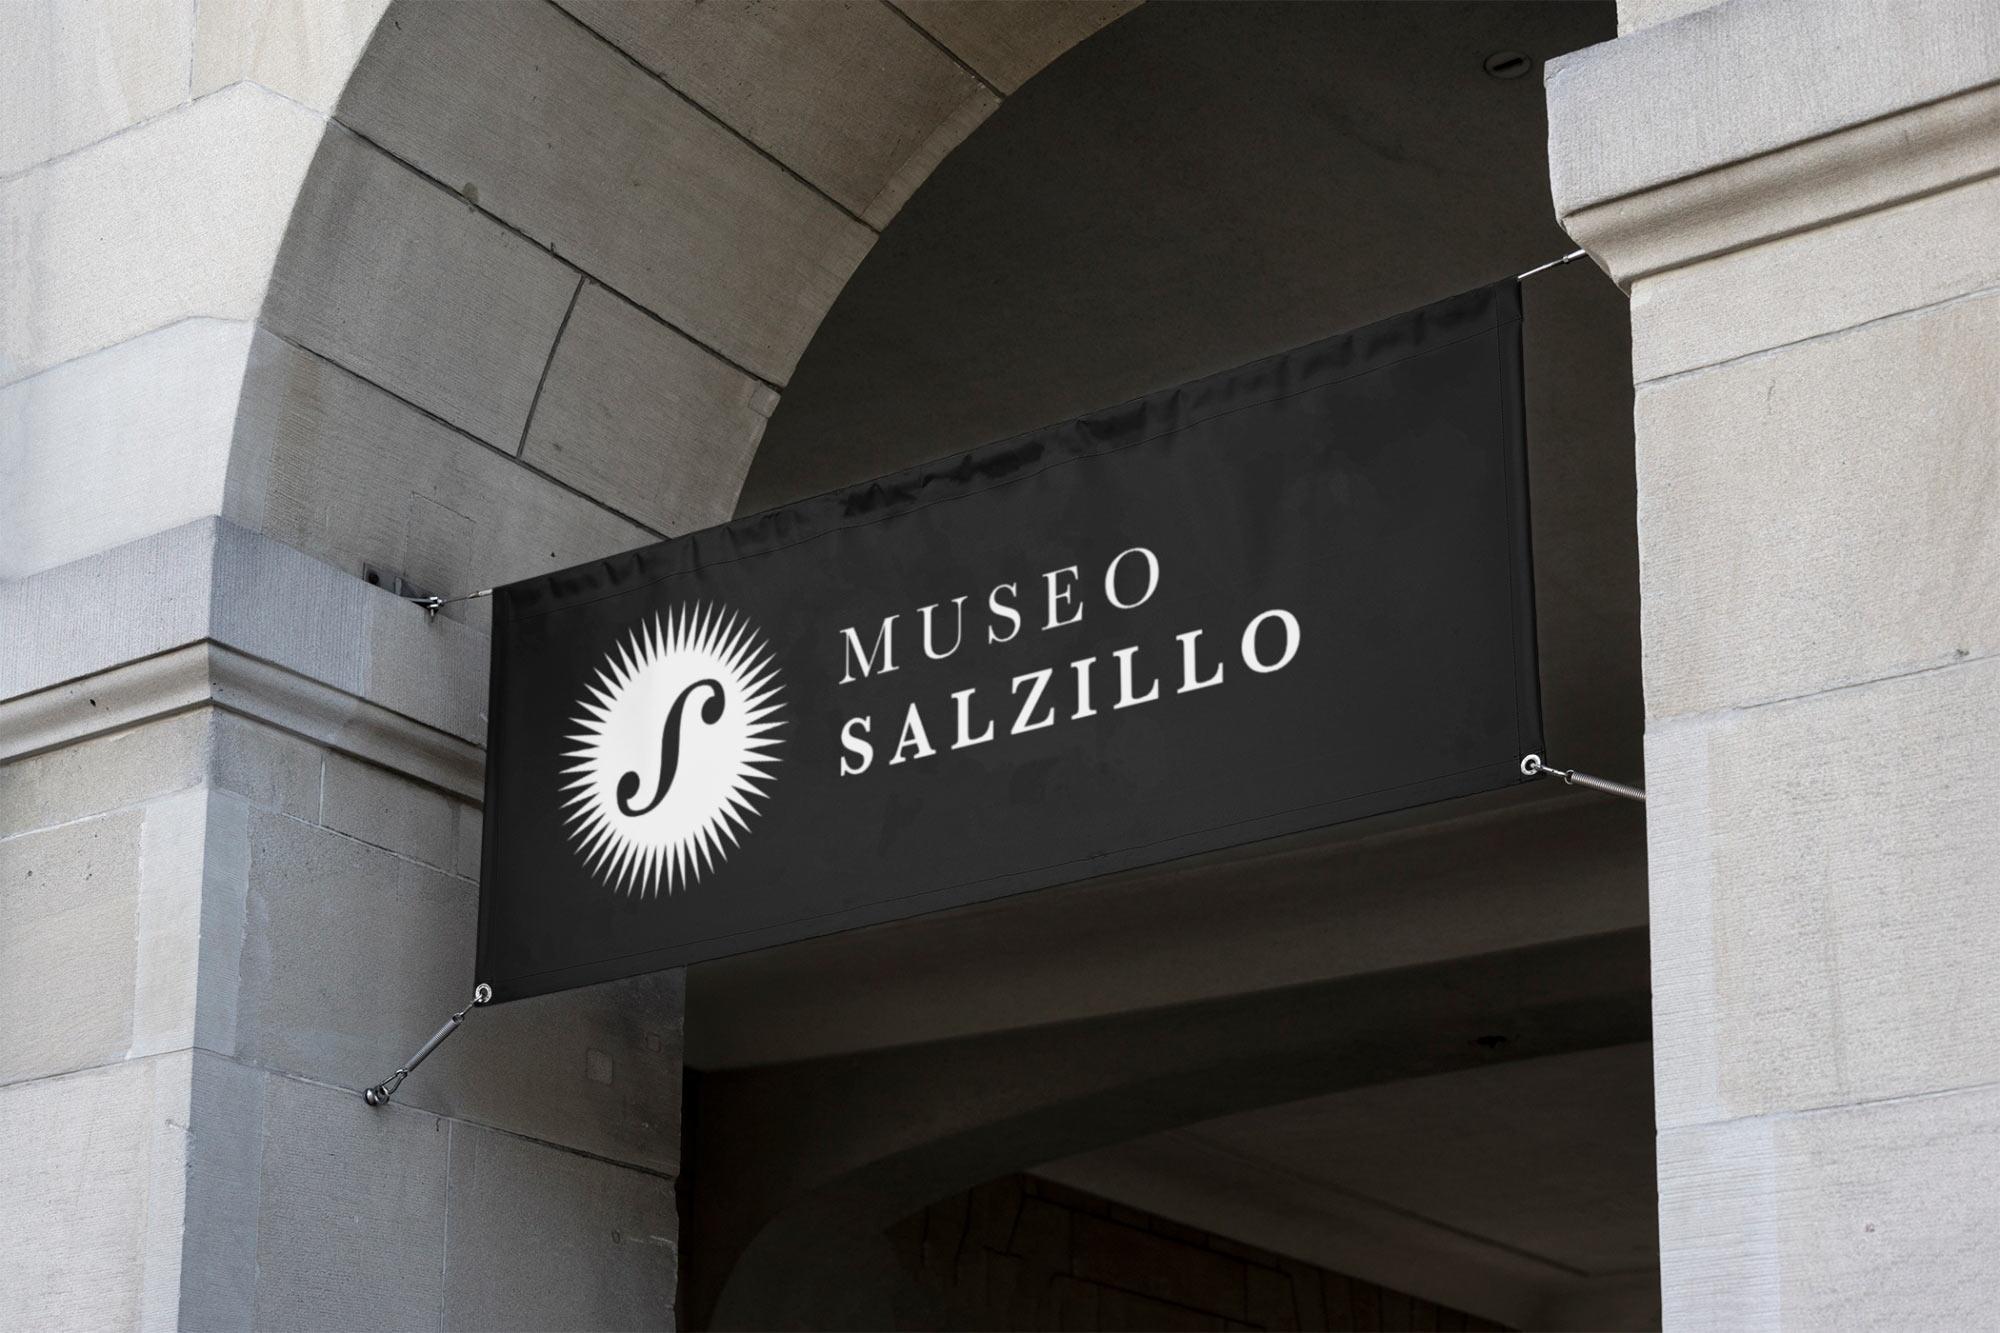 Museo-salzillo-branding-01